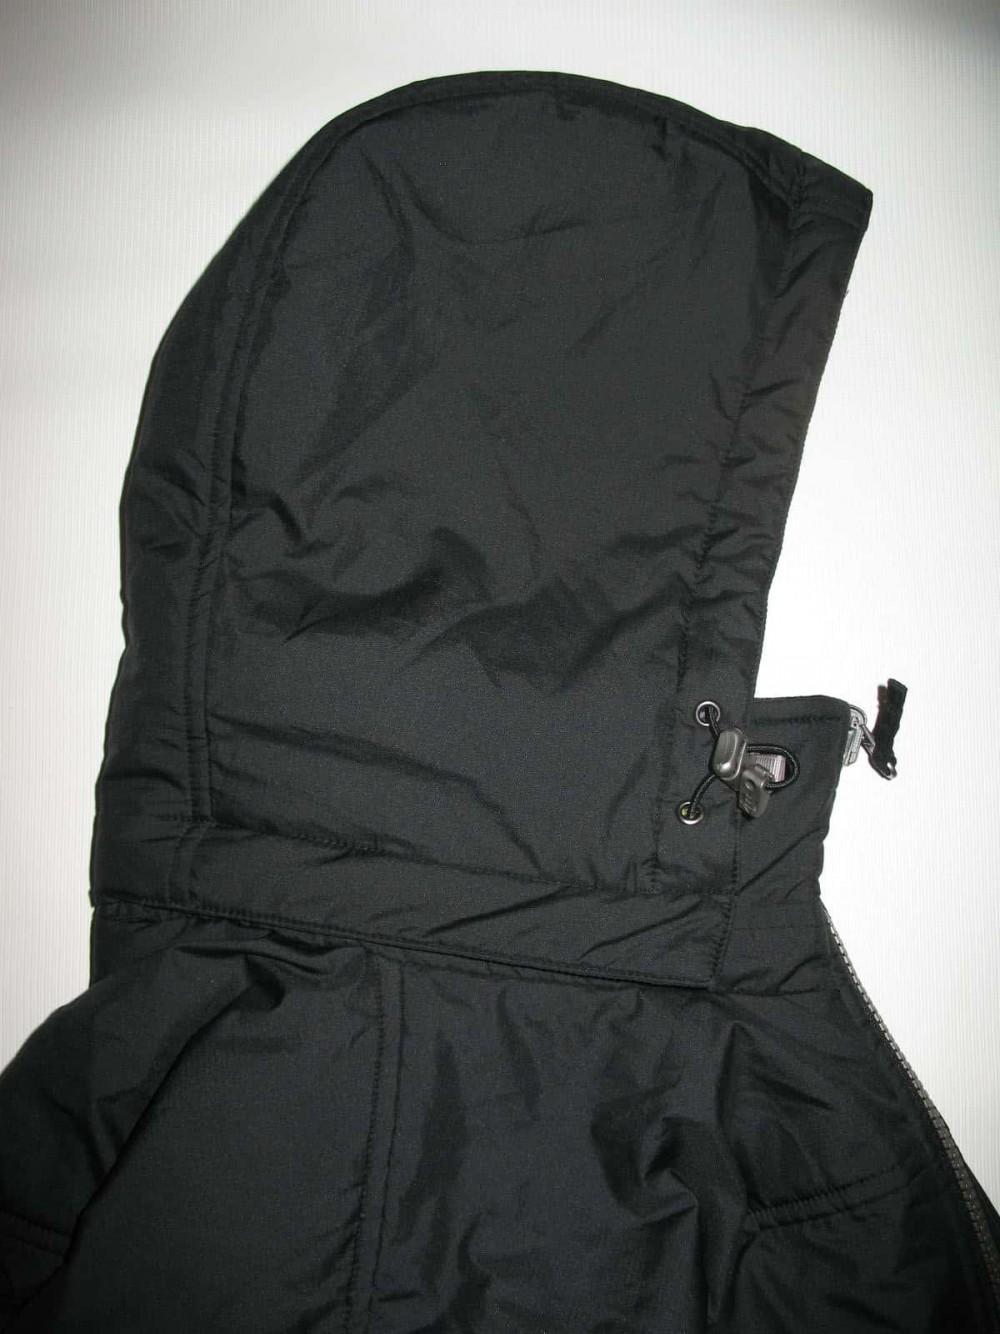 Куртка MAYA MAYA ultralight primaloft jacket (размер M) - 9